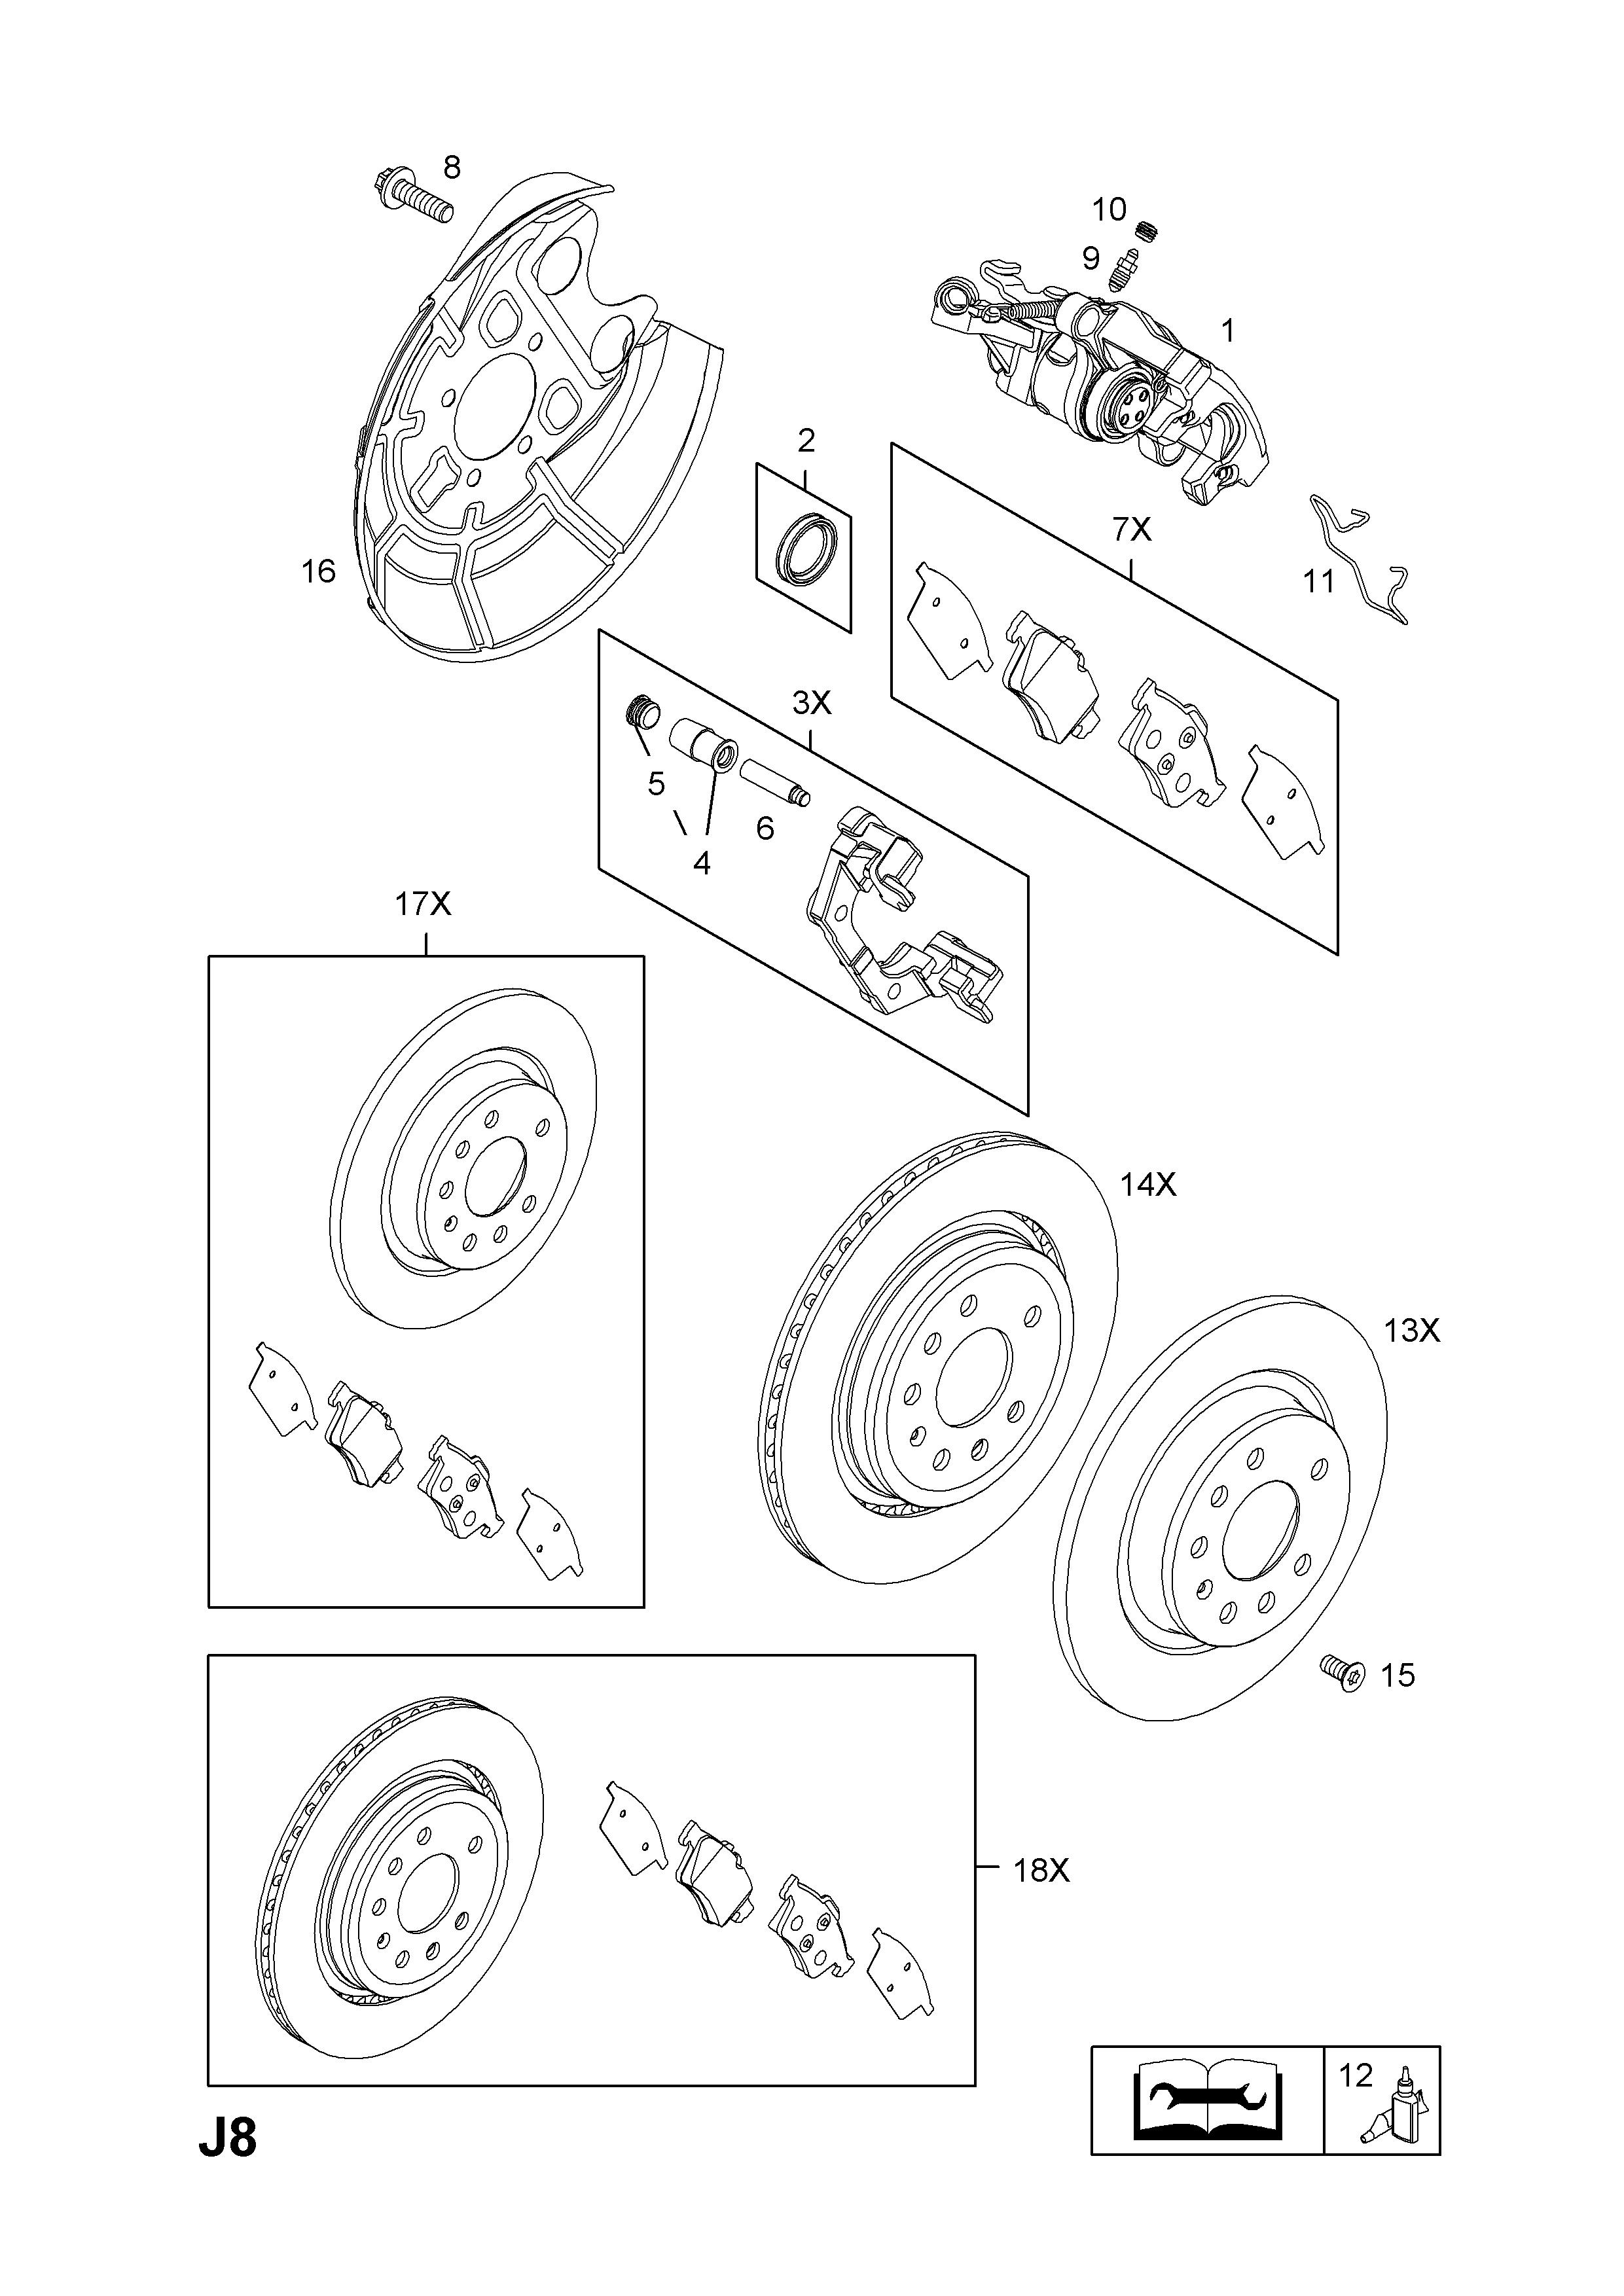 Opel Brakes Diagram Wiring Diagram